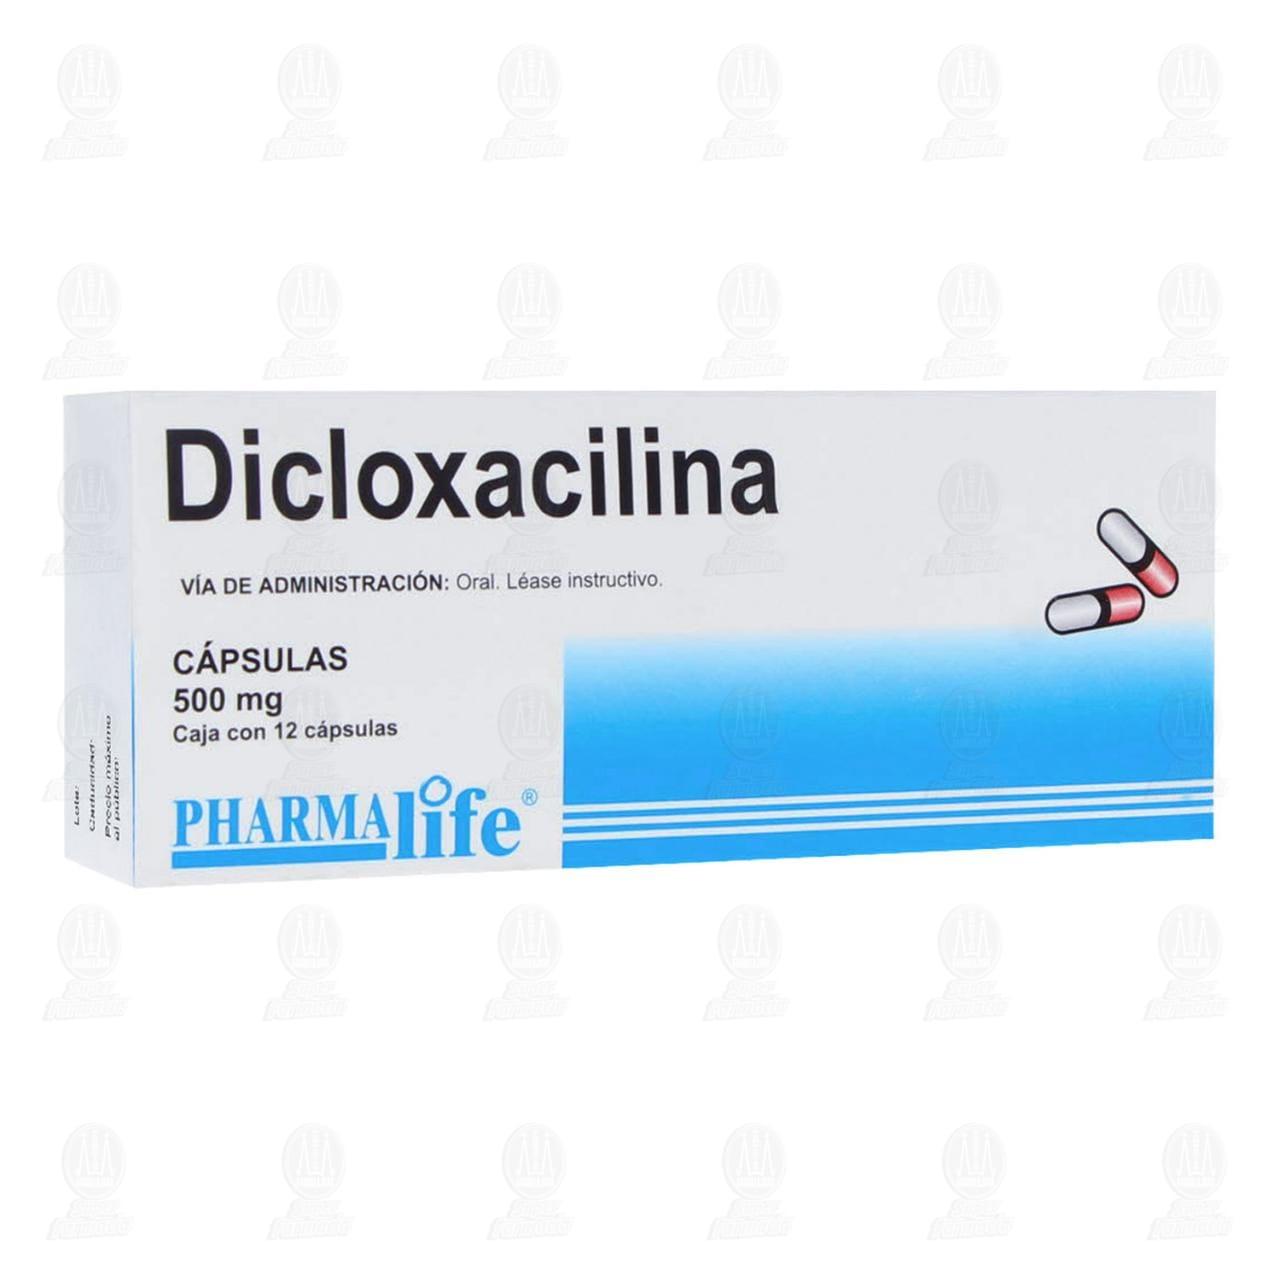 Comprar Dicloxacilina 500mg 12 Cápsulas Pharmalife en Farmacias Guadalajara